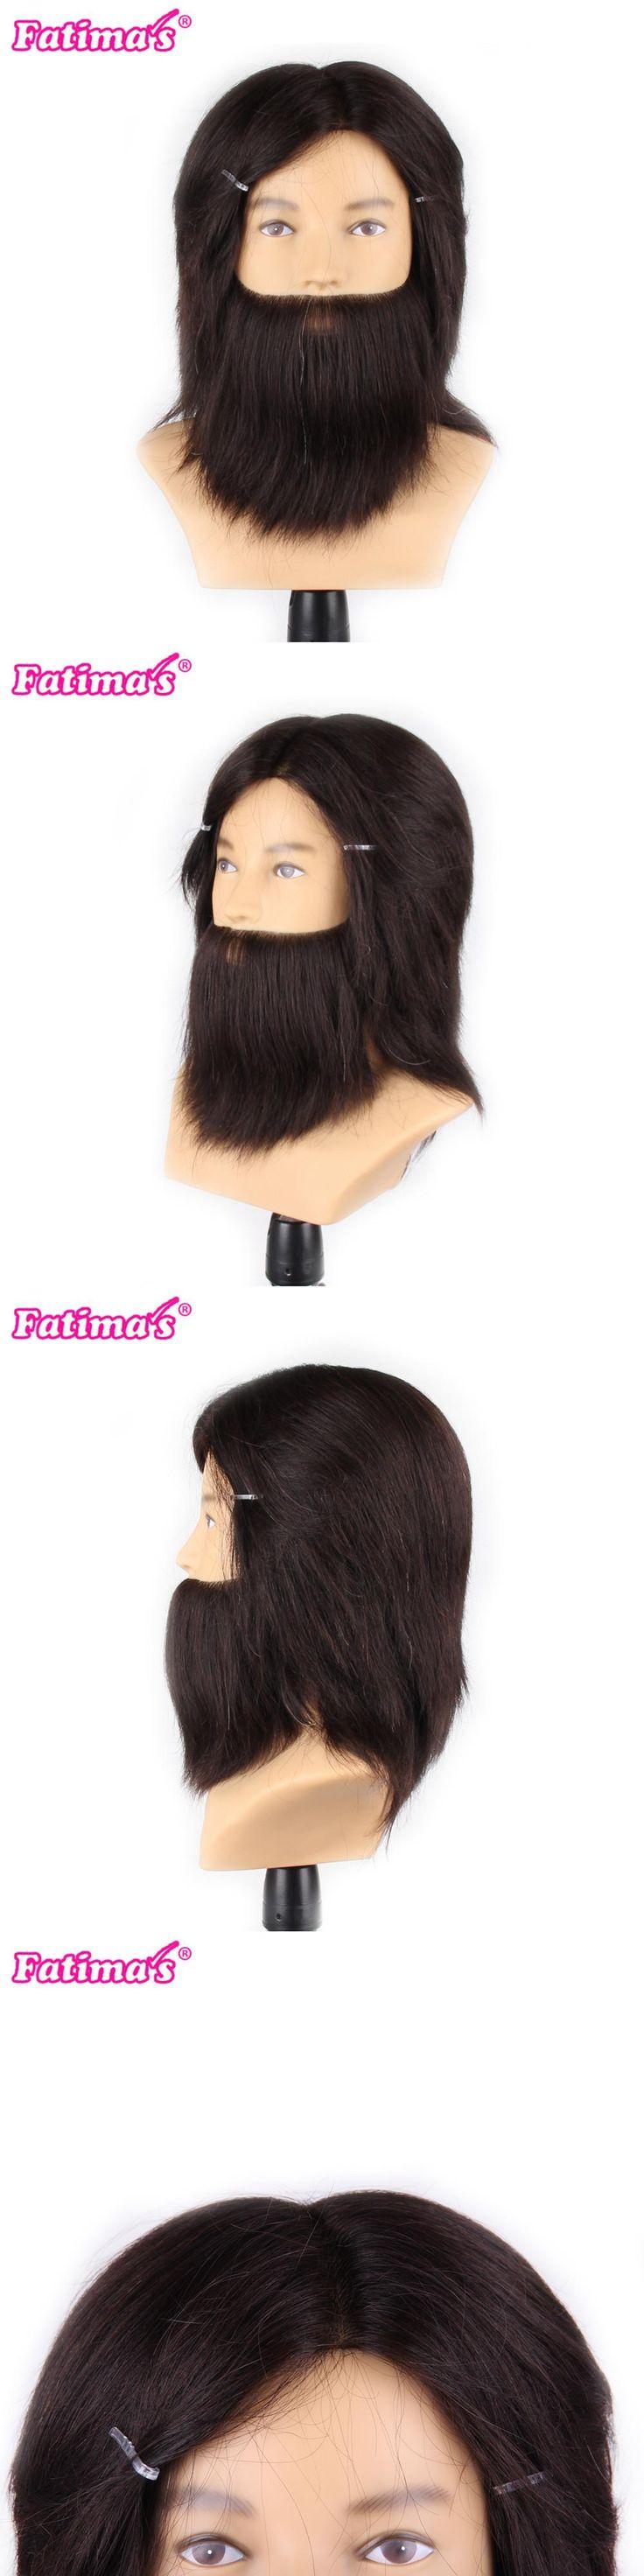 Fatimas 100% Real Animal Hair Hairdressing Training Head Mannequin Head Hair Cut Salon Practice Model